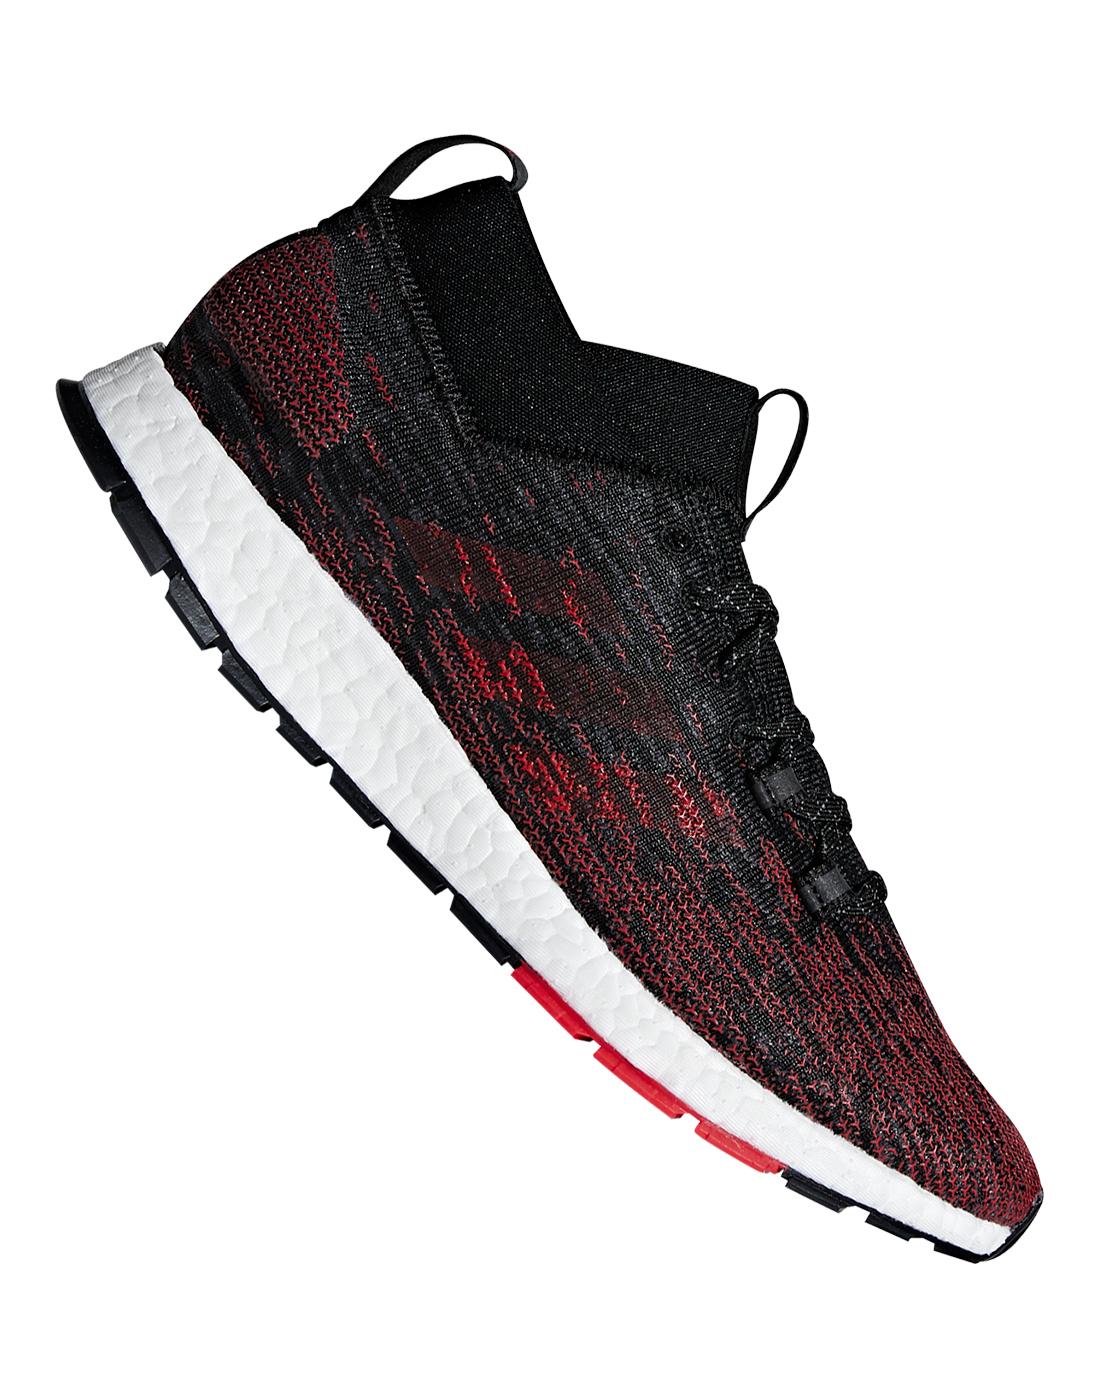 e5f41b70d210d Men s Black   Red adidas Pureboost Running Shoes